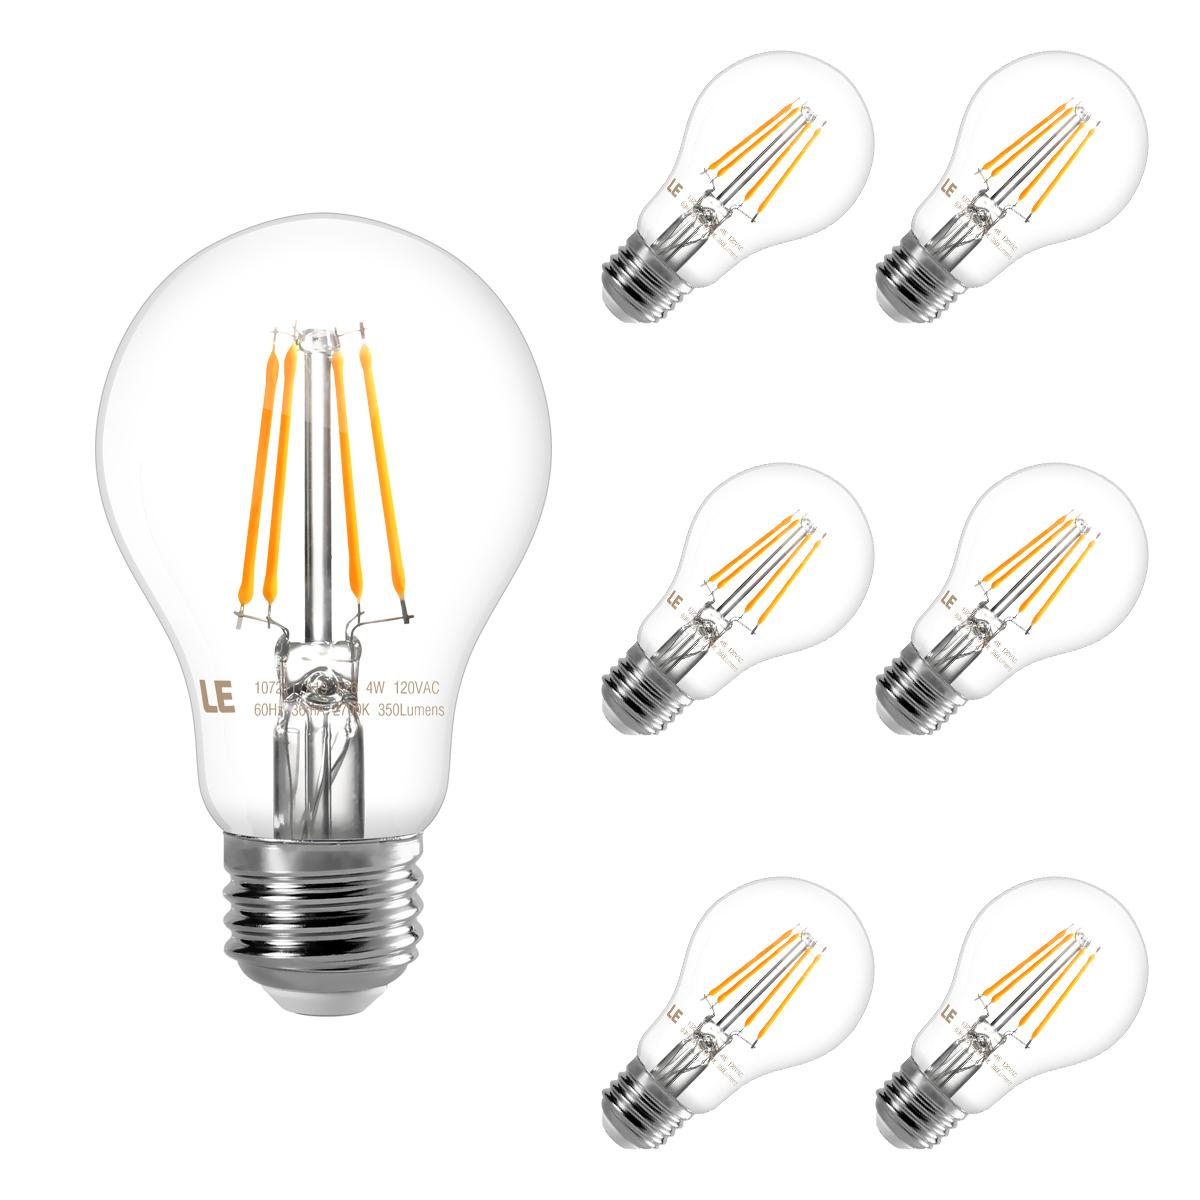 4w Warm White A19 E26 Led Light Bulbs 40 Watt Incandescent Equivalent